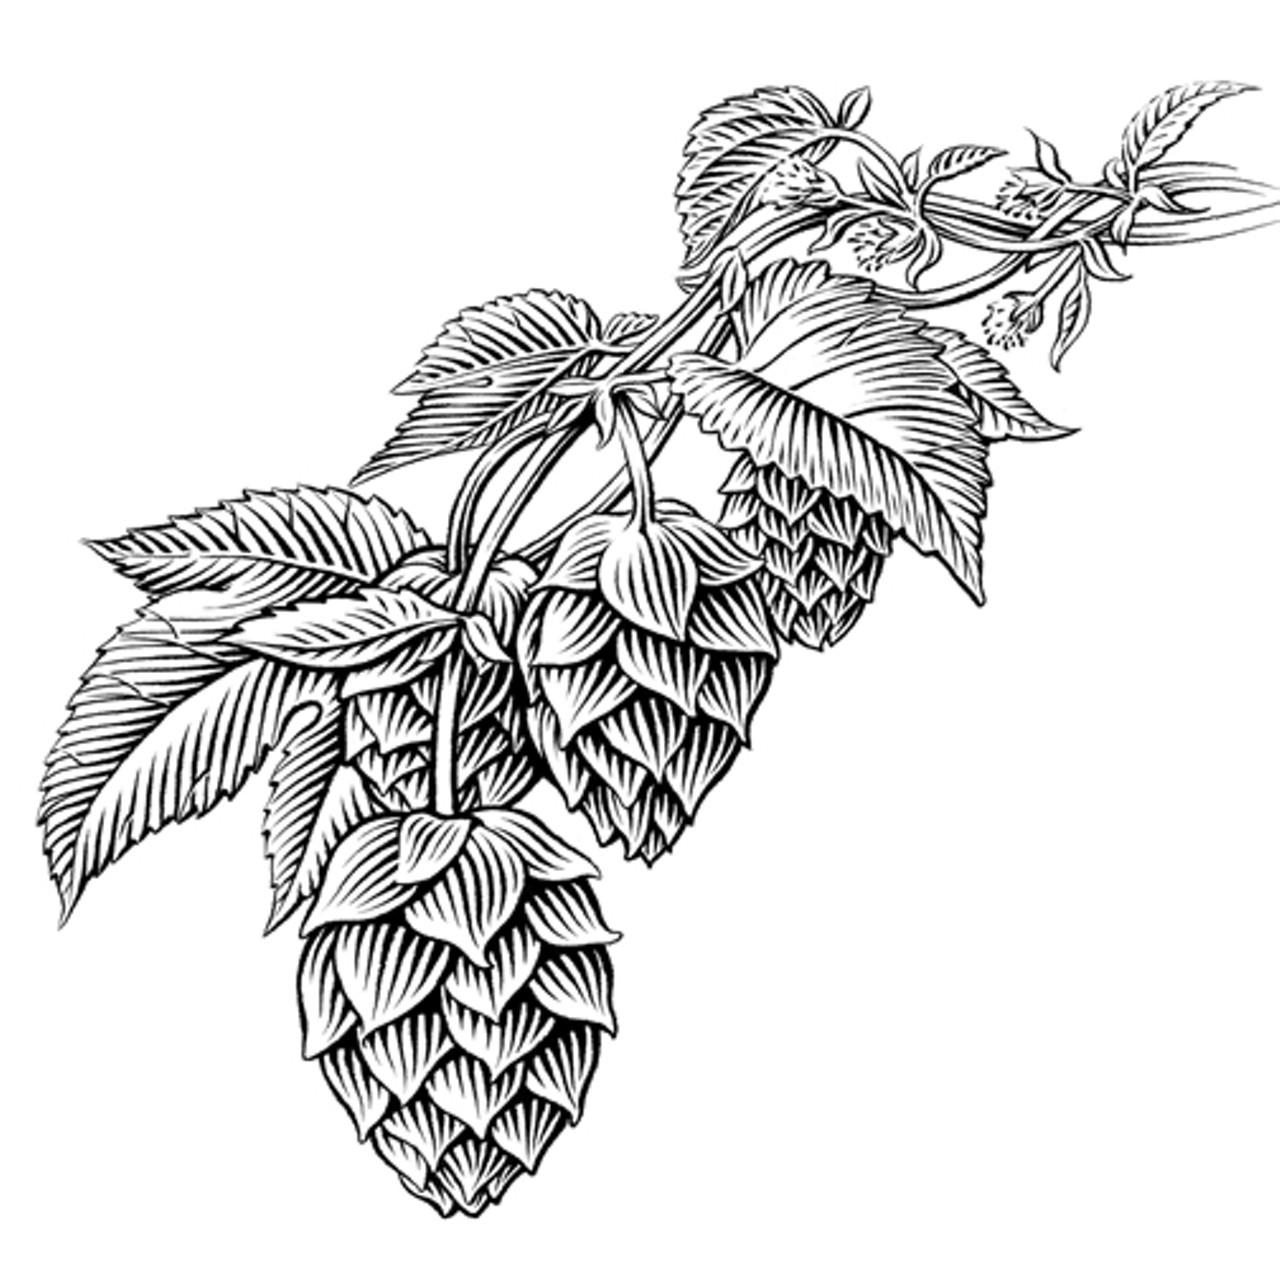 1280x1280 Hops Drawing